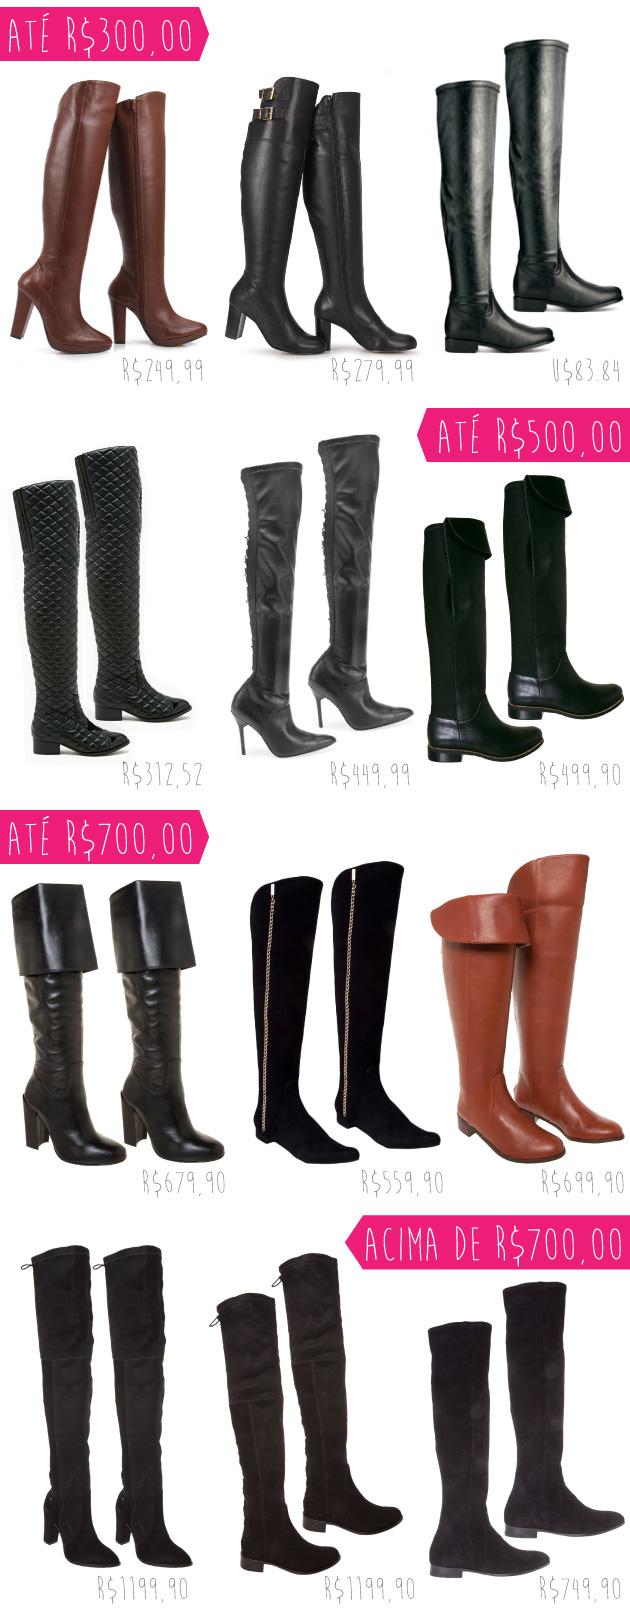 bota-over-the-knee-preco-onde-comprar-online-loja-shopping-bota-cuissarde-boots-inverno-2014-quanto-custa-vitrine-1